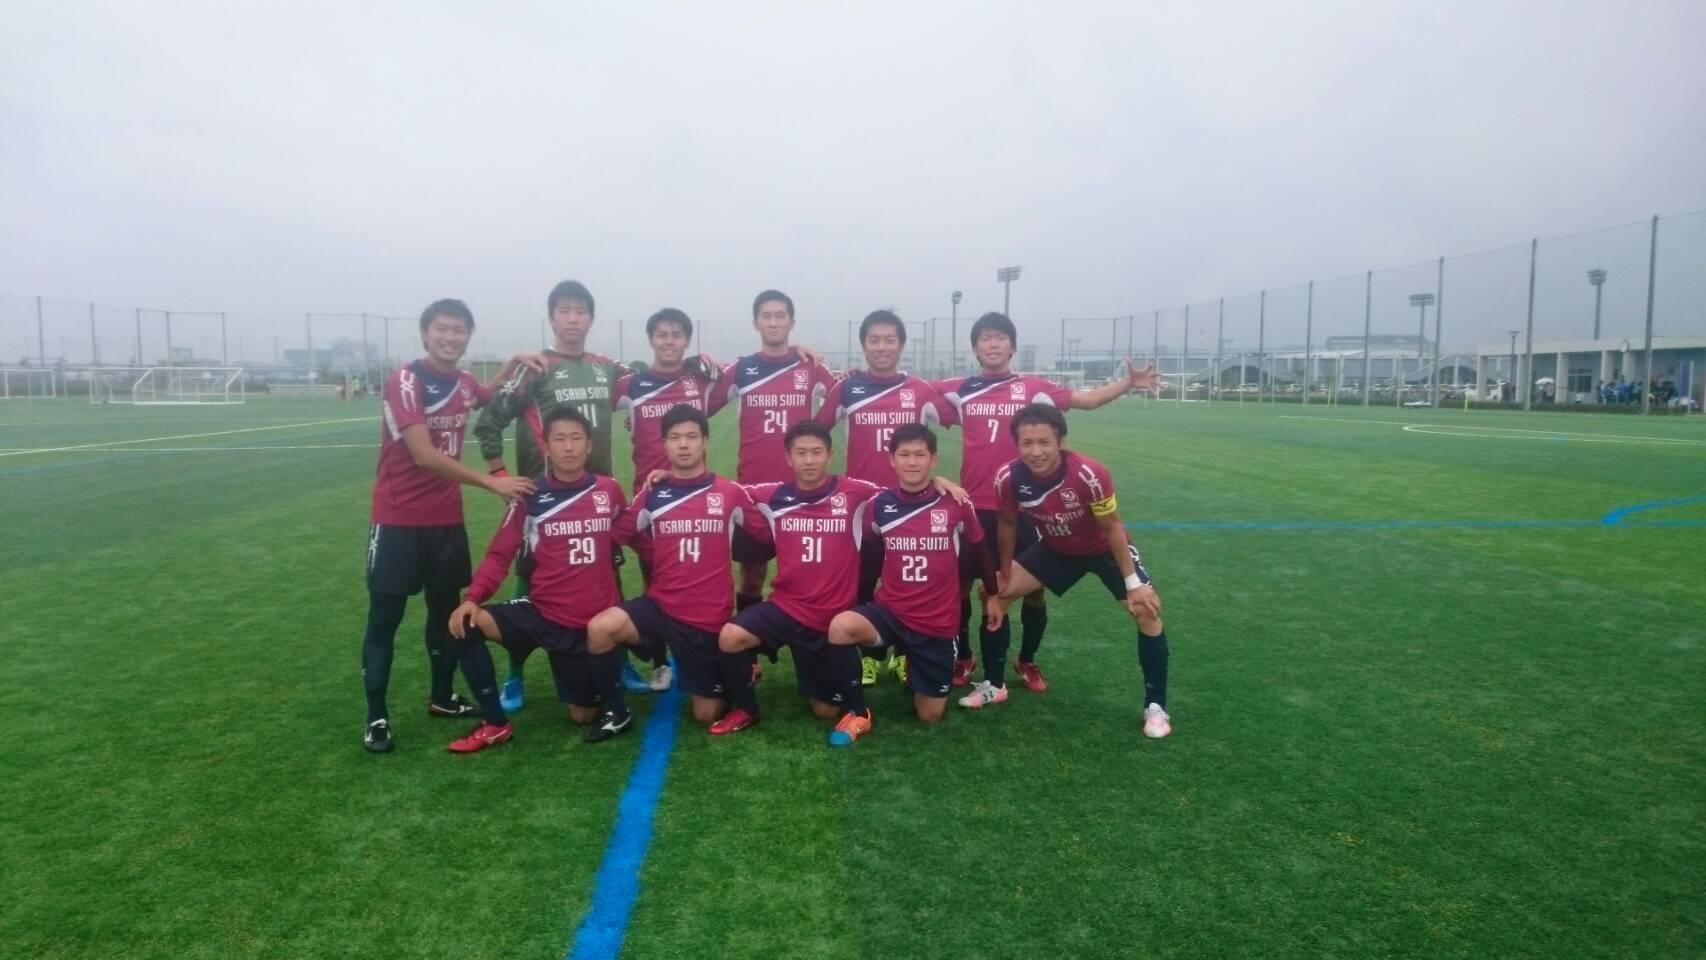 2016年 大阪府リーグ1部 第2節 vs F.C.Lazo 試合前